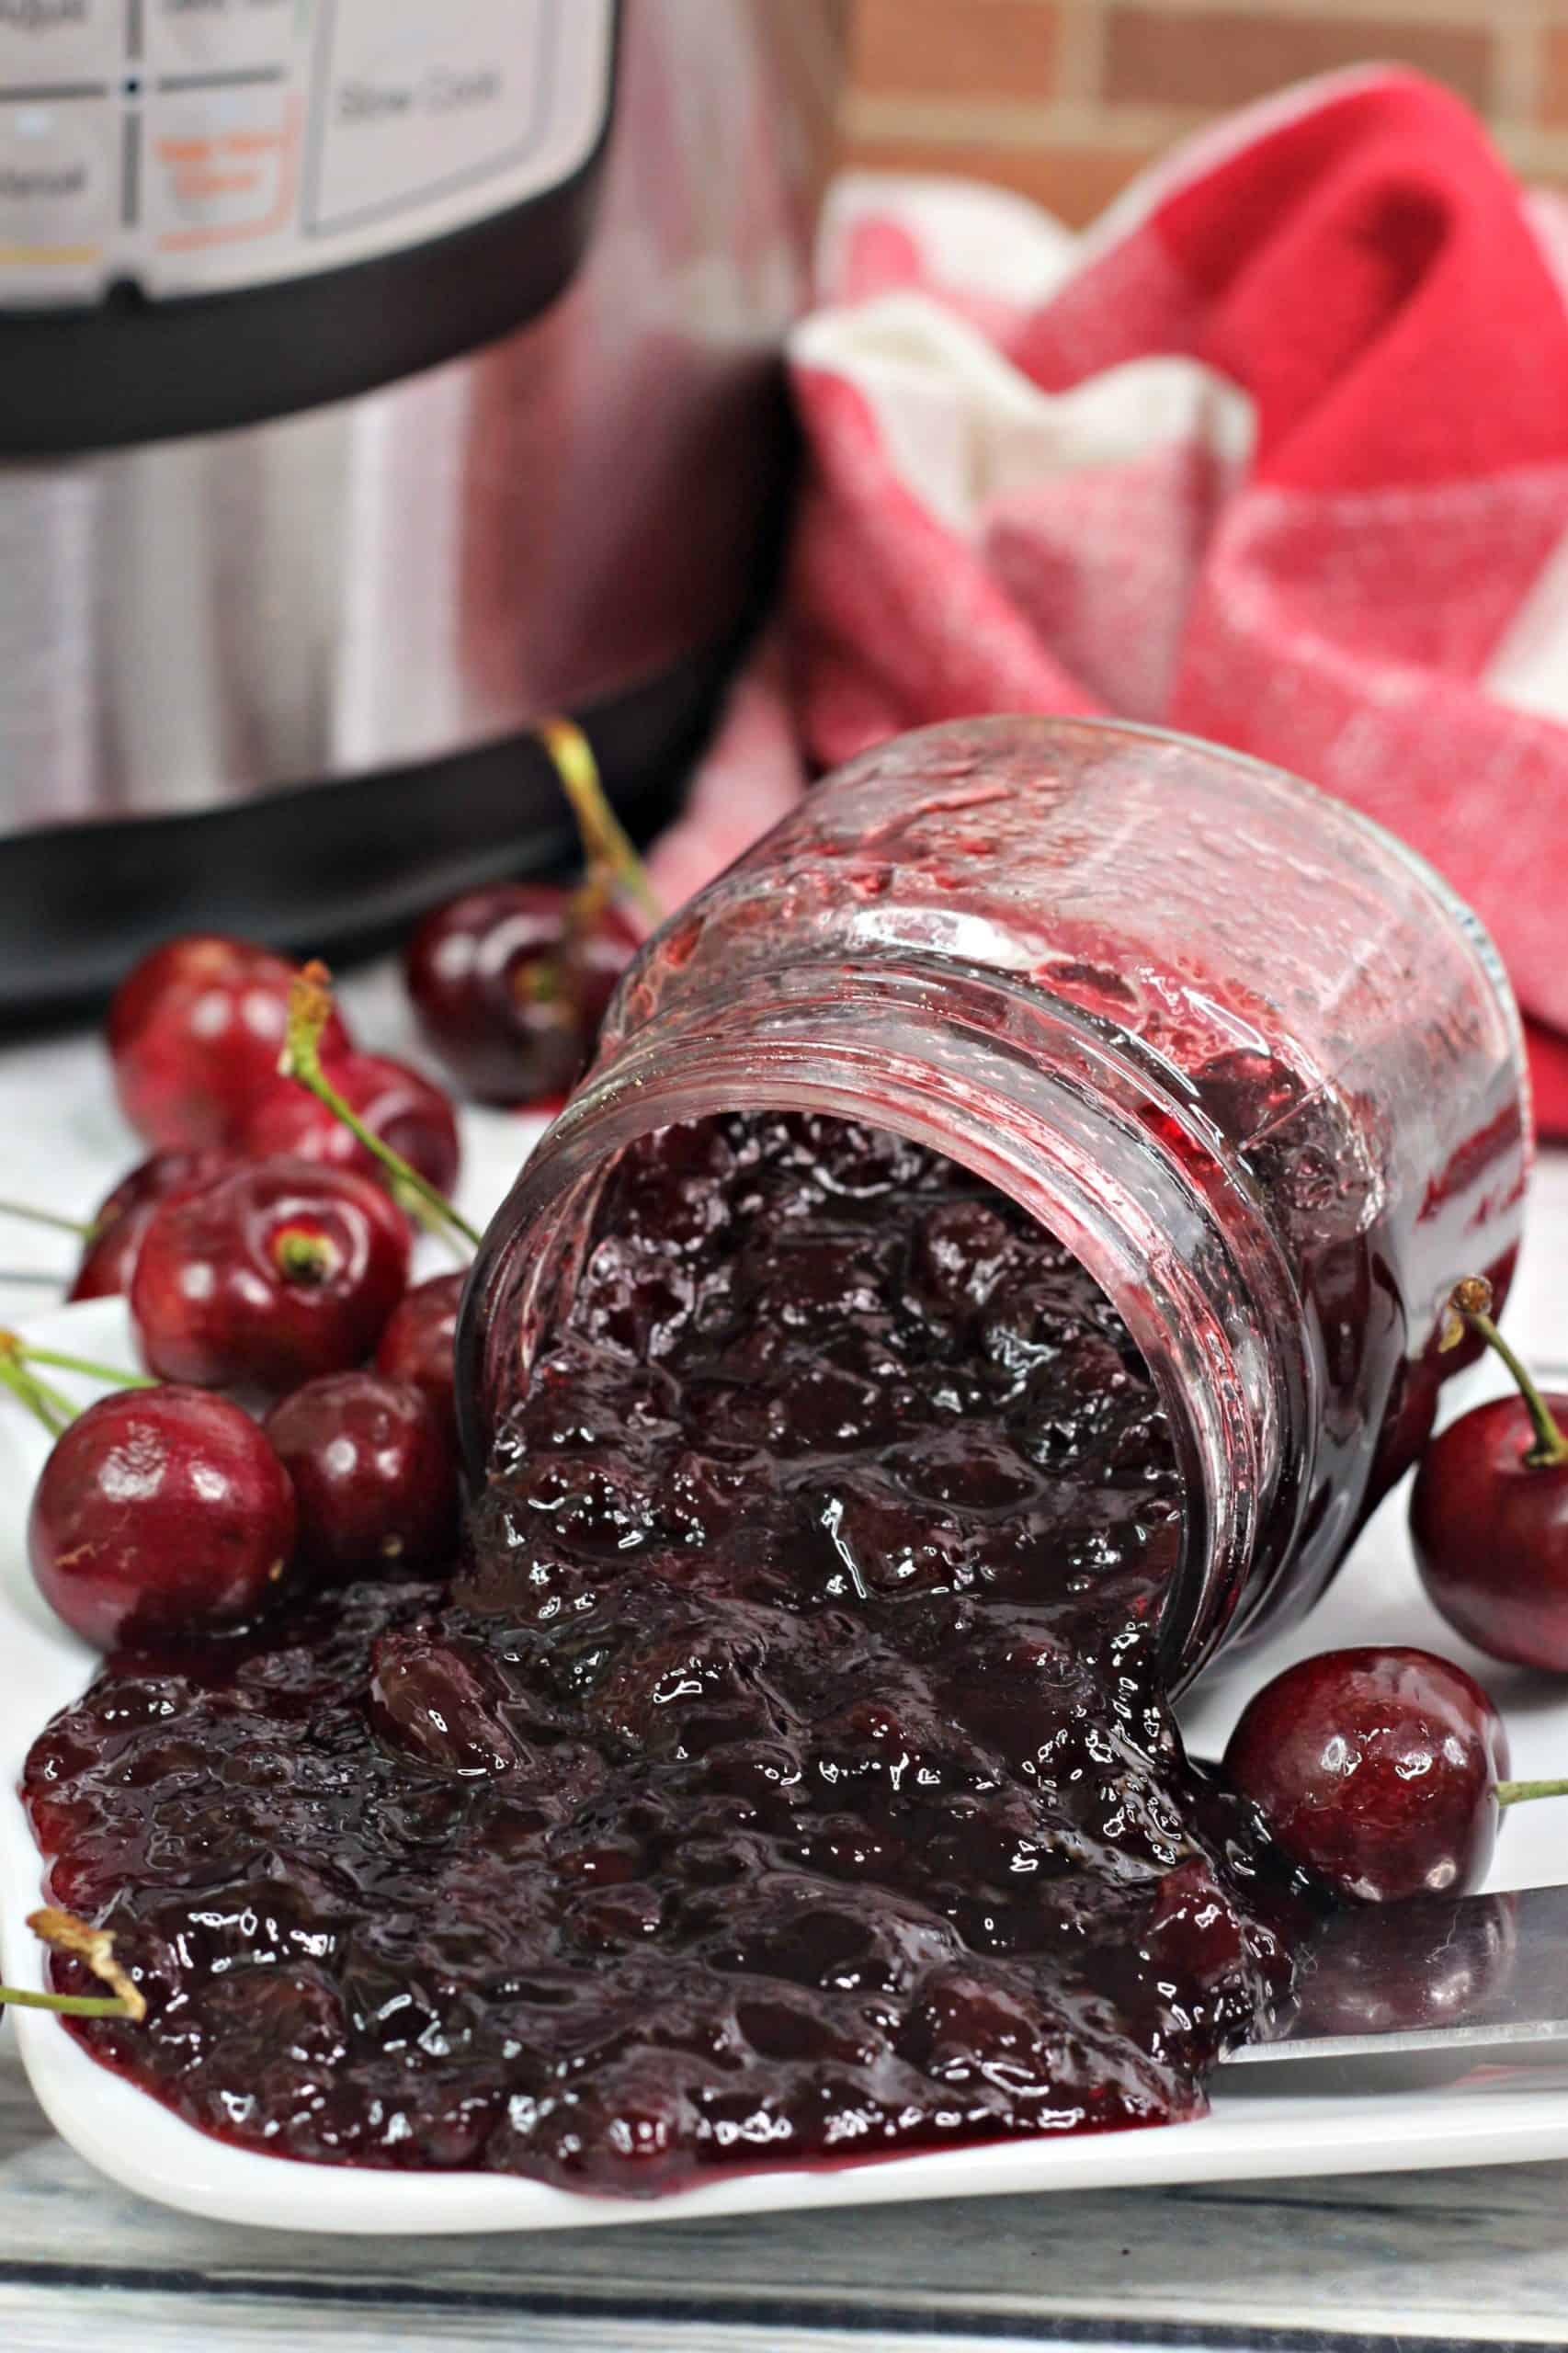 Cherry Jam spilled on plate